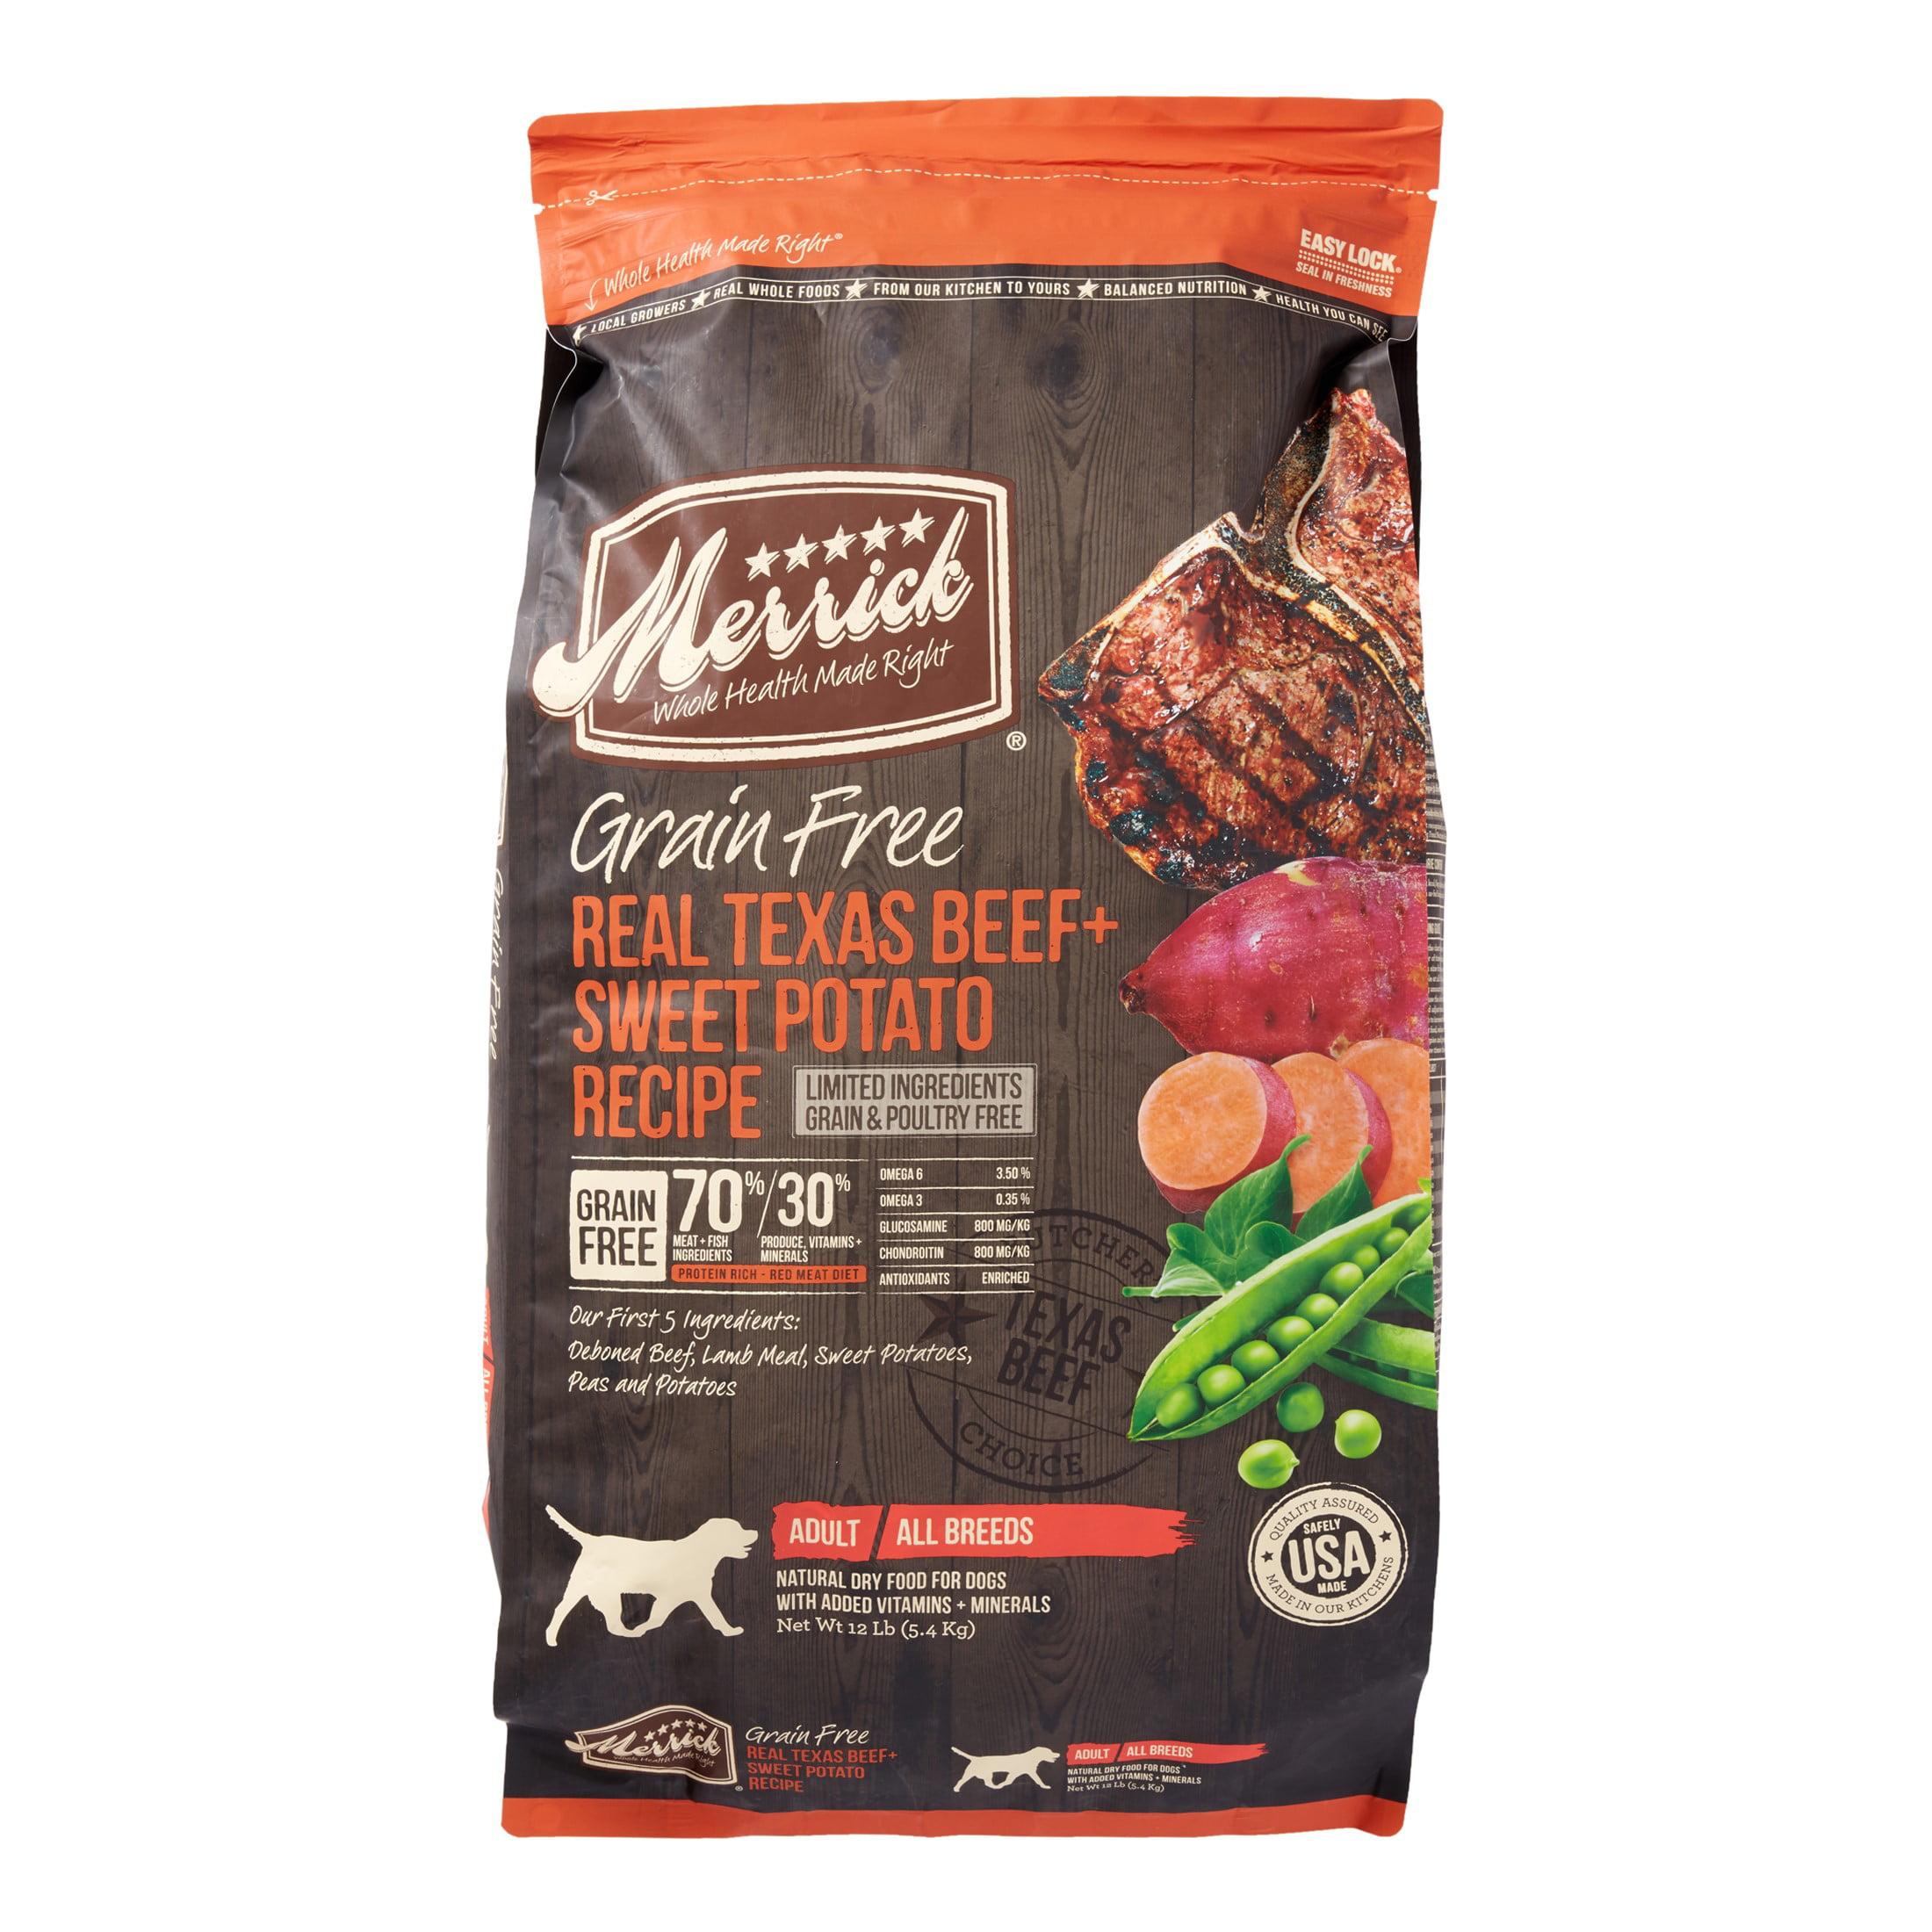 Merrick Grain-Free Real Texas Beef + Sweet Potato Recipe Dry Dog Food, 12 lb